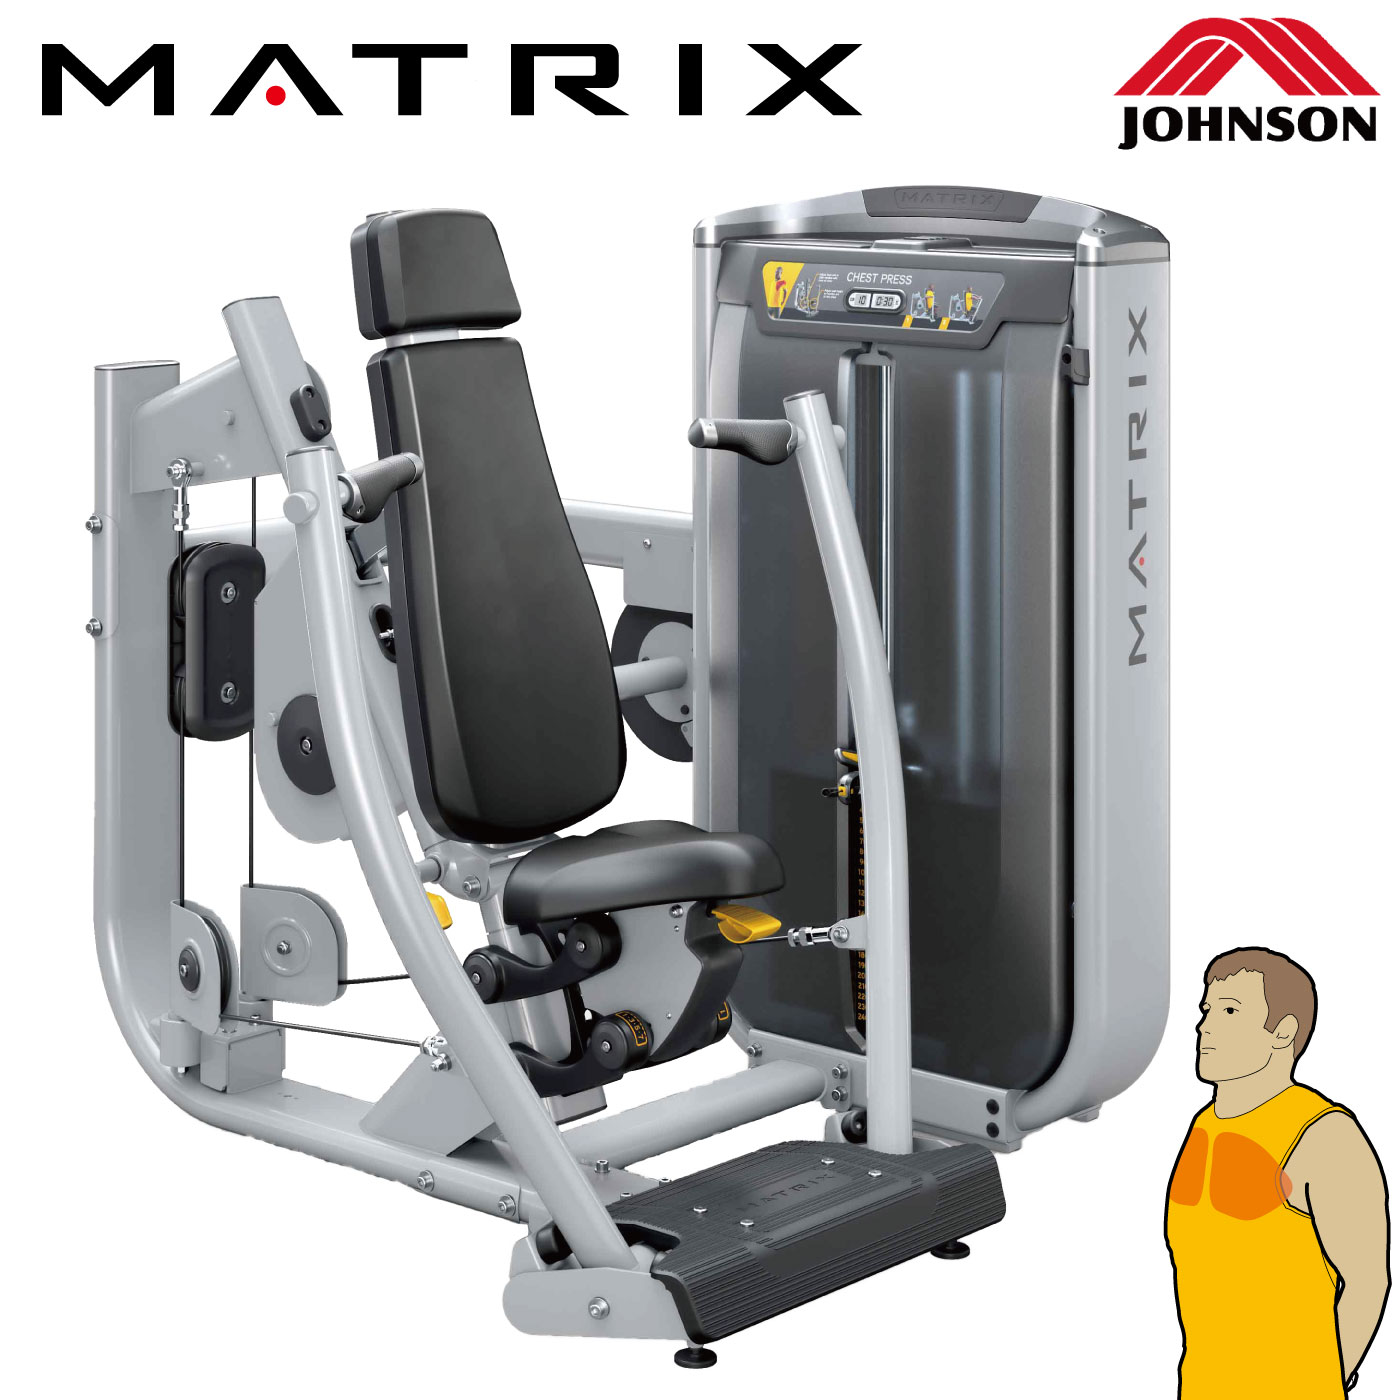 G7-S13-V2(チェストプレス)〈アルトラV2シリーズ〉/業務用ストレングスマシン〈業務用MATRIX〉《ジョンソンヘルステック》